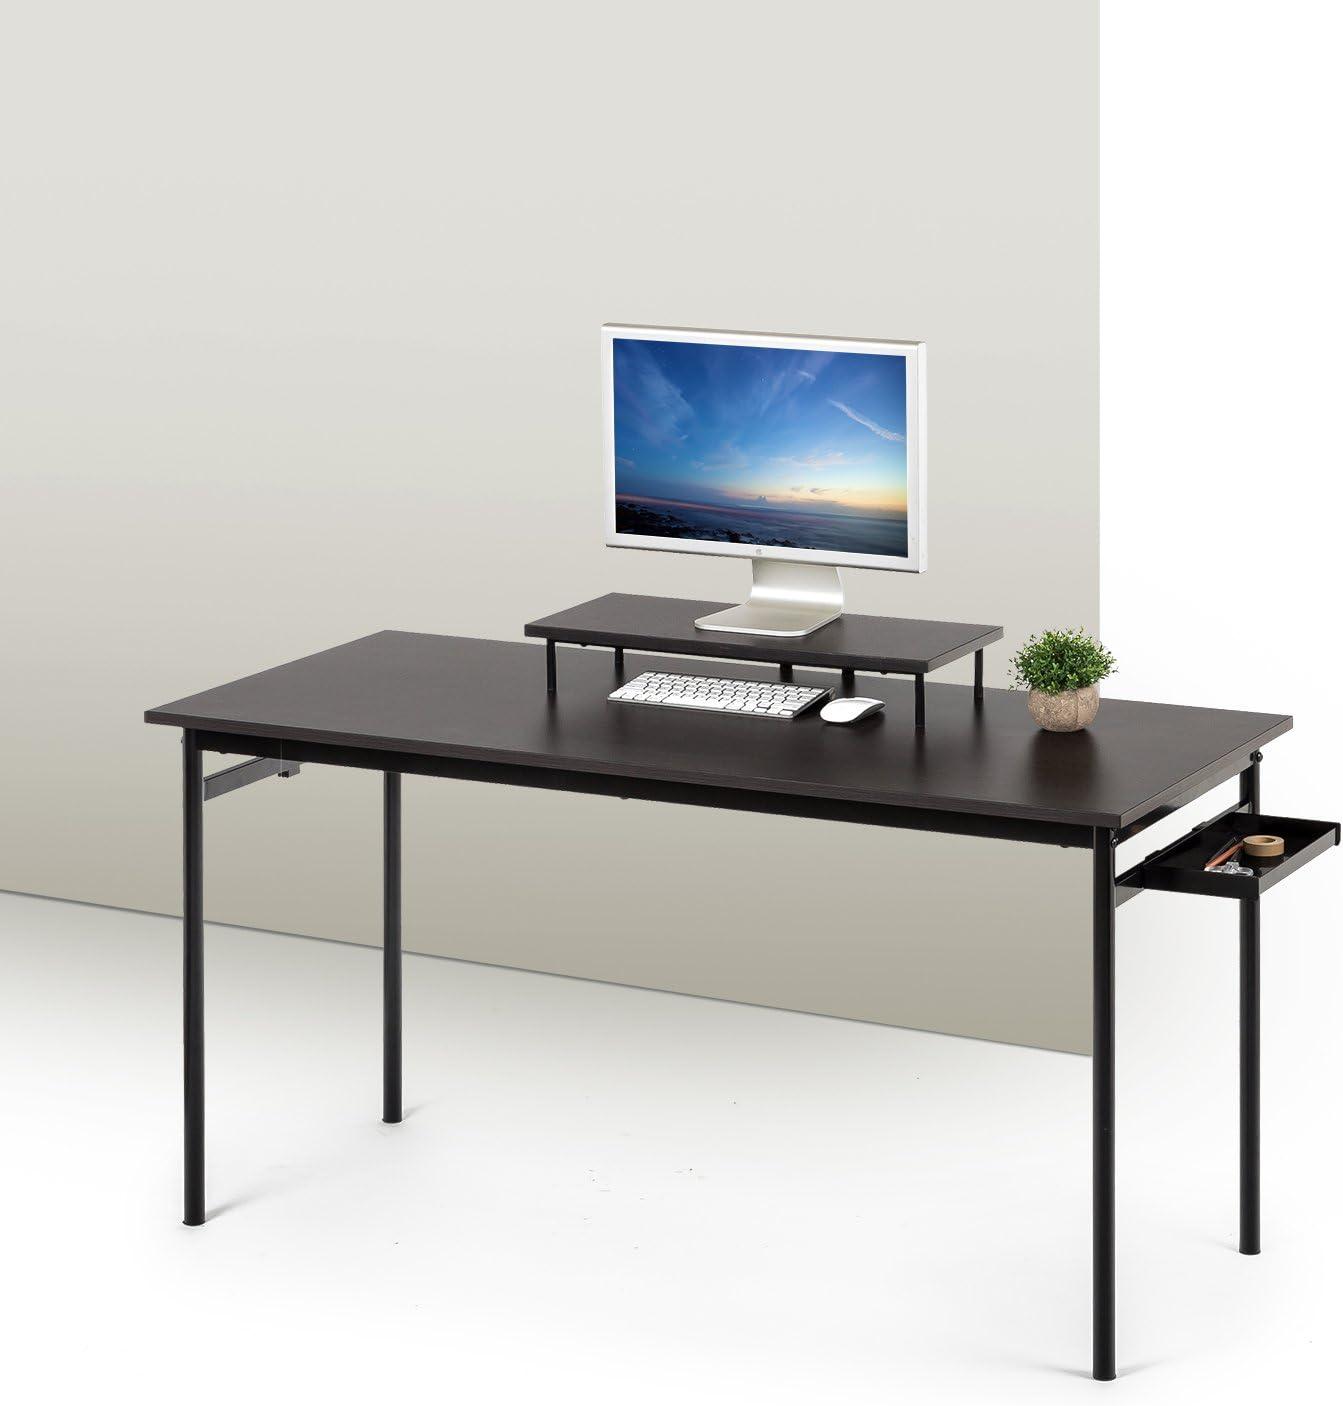 Zinus Tresa Computer Indefinitely Popularity Desk in Espresso Medium Workstation